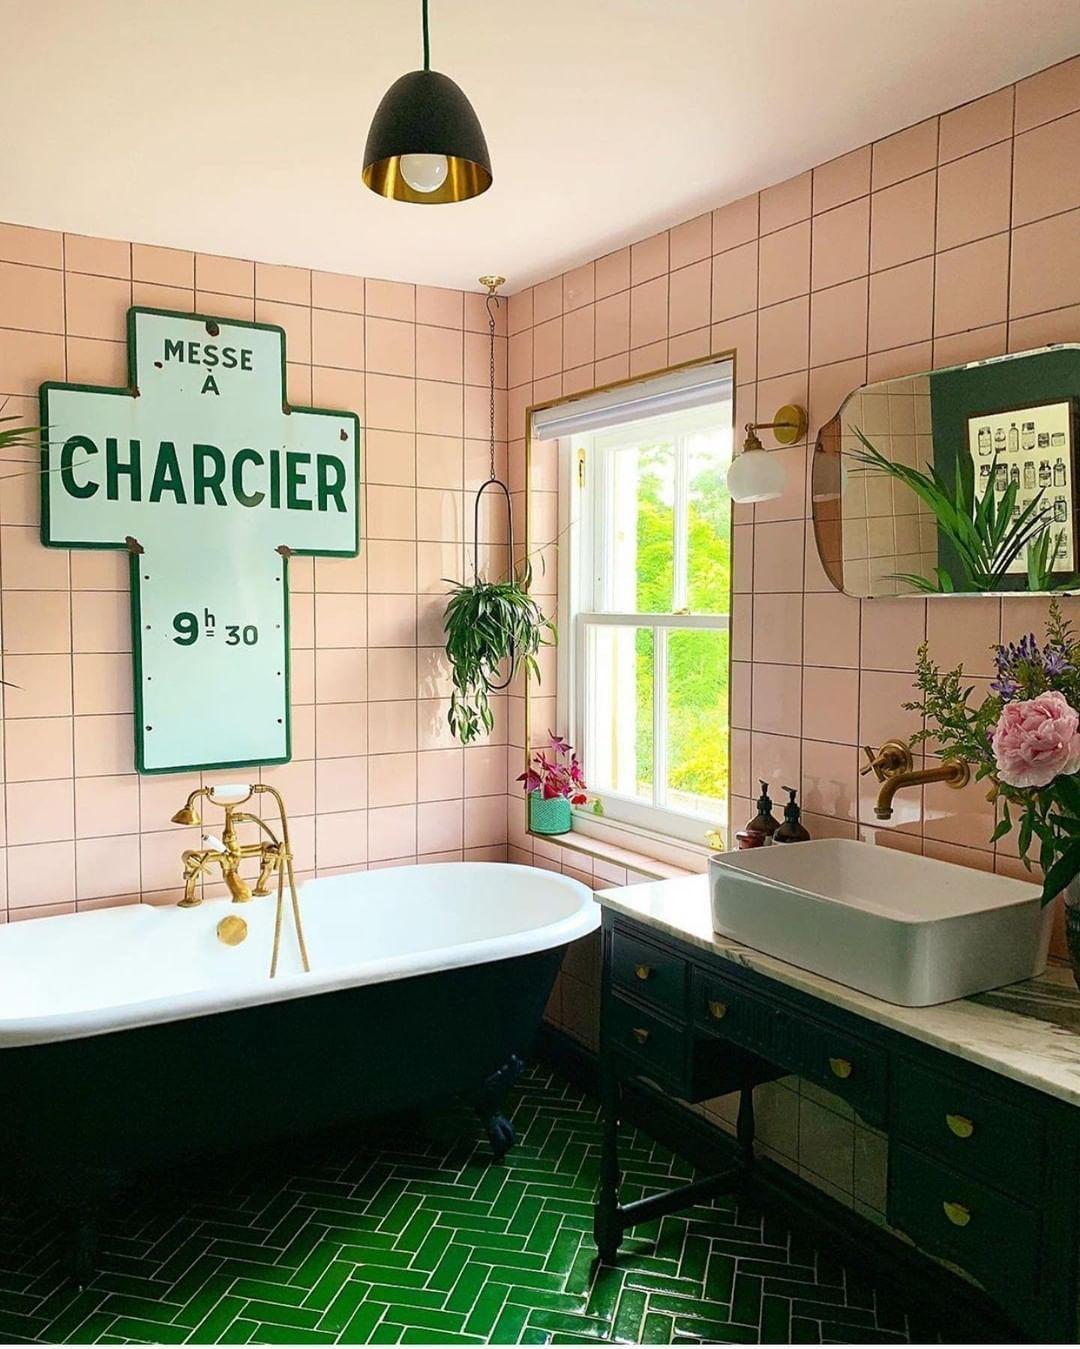 The Pink And Green Bathroom Green Bathroom Pink Bathroom Accessories Mint Green Bathrooms